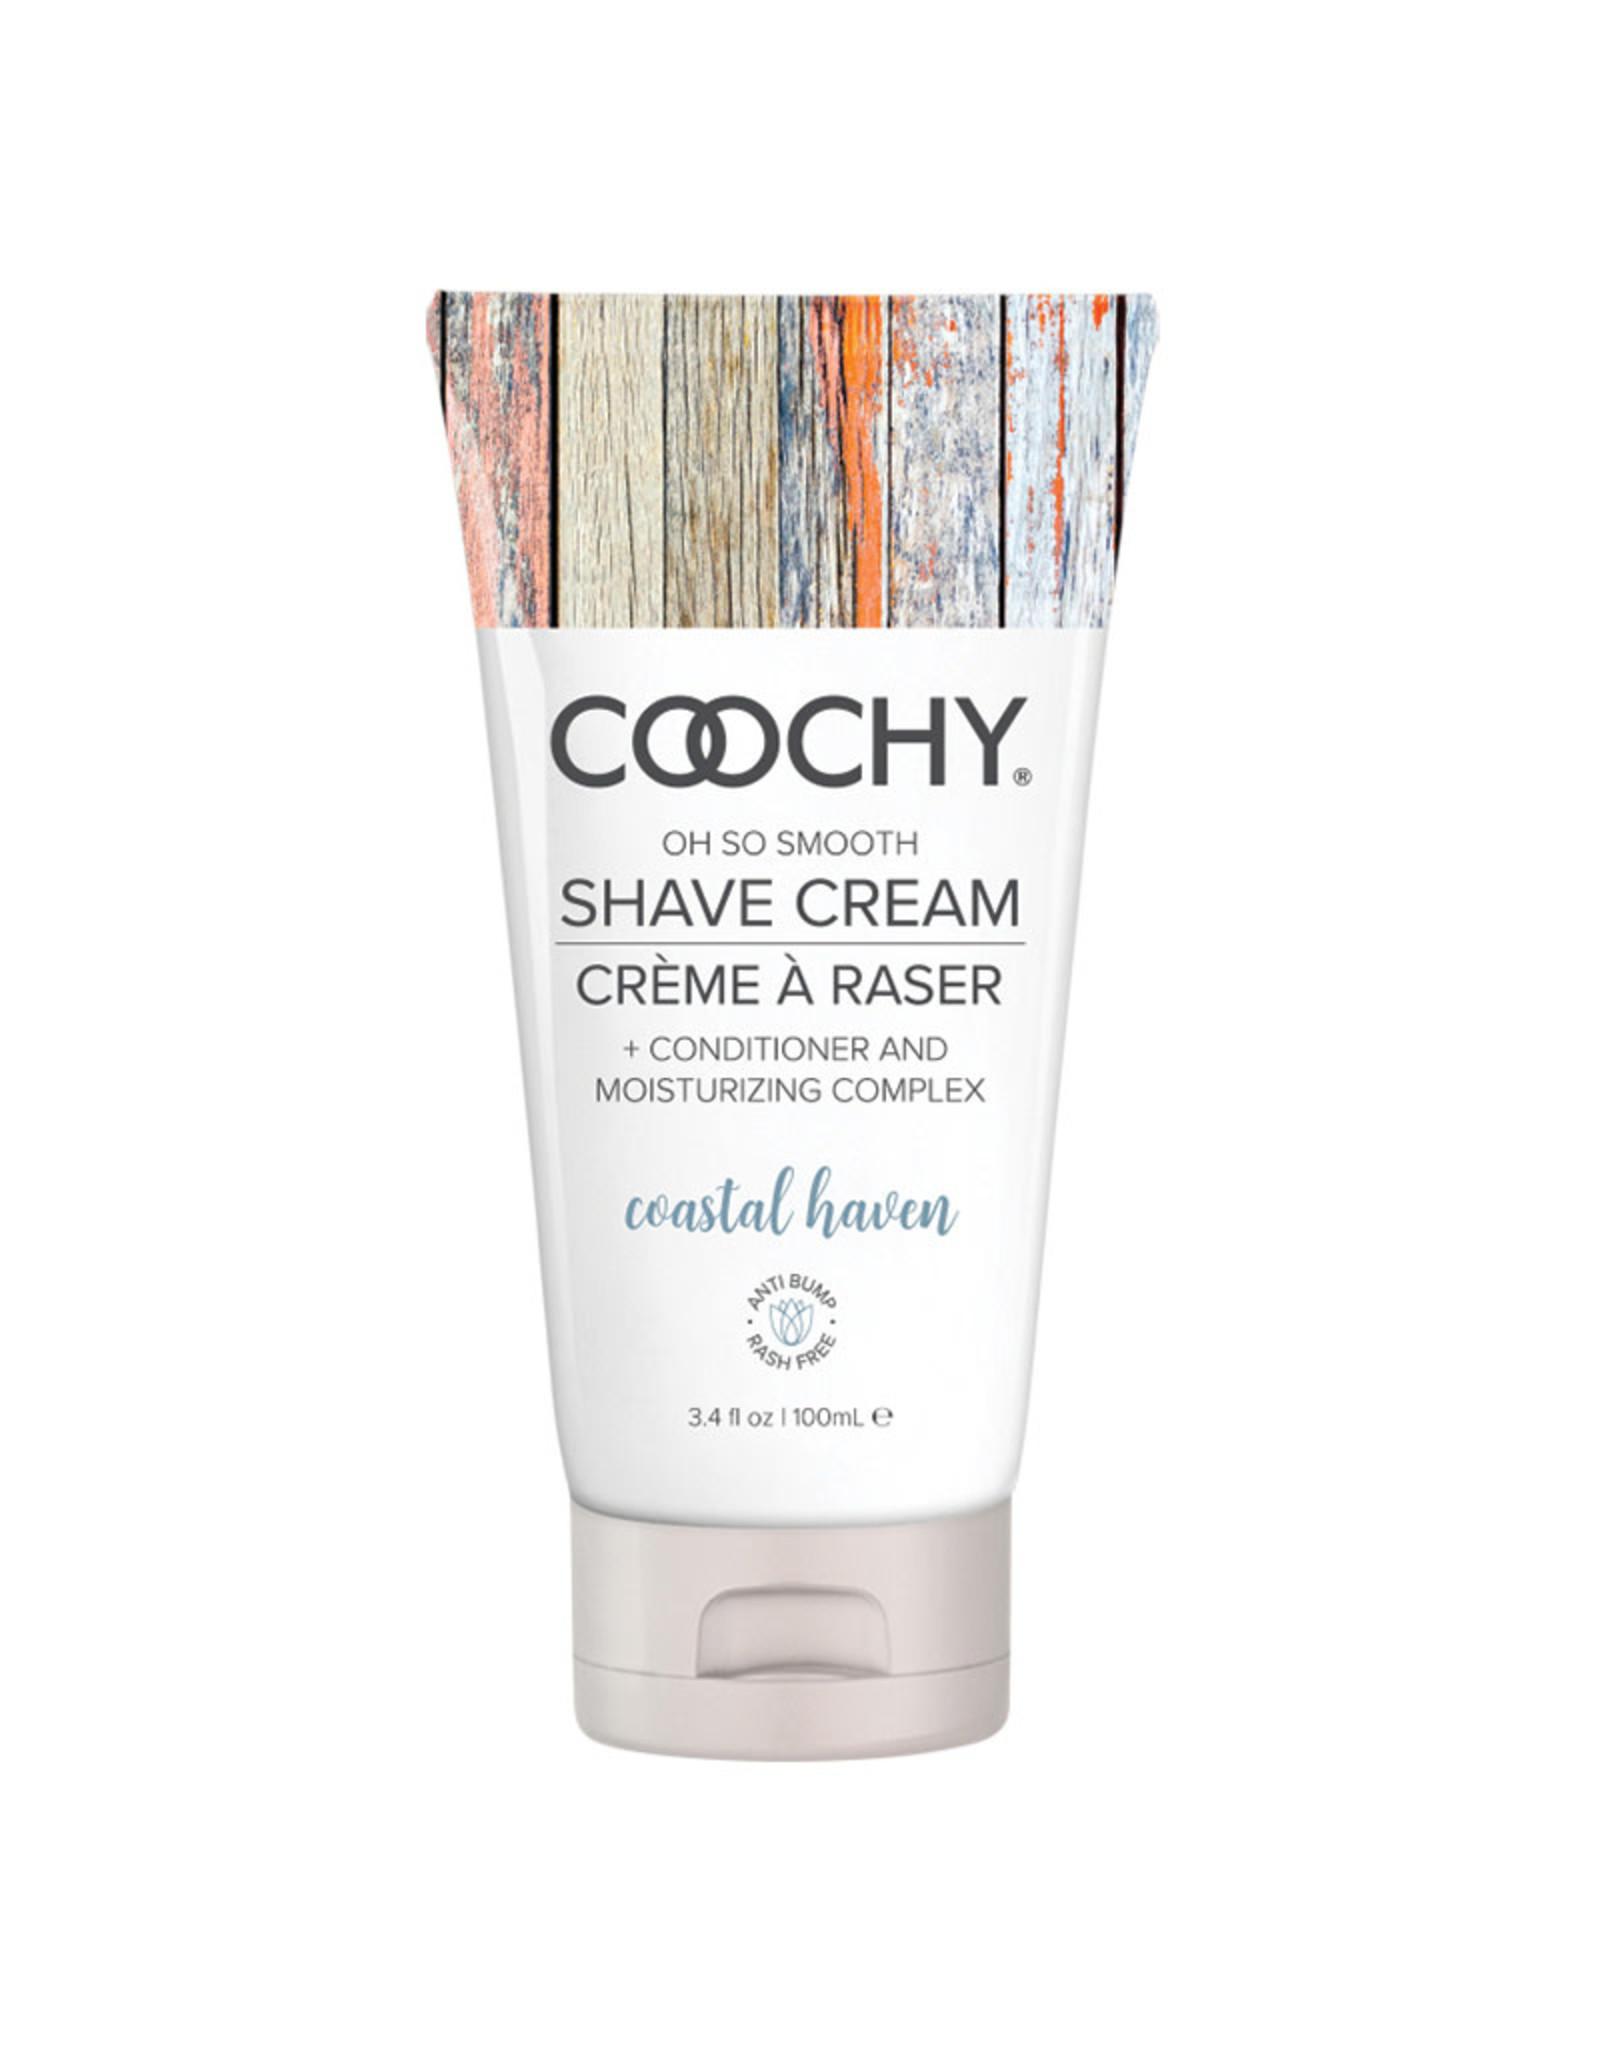 Classic Brands Coochy - Coastal Haven - 3.4 oz